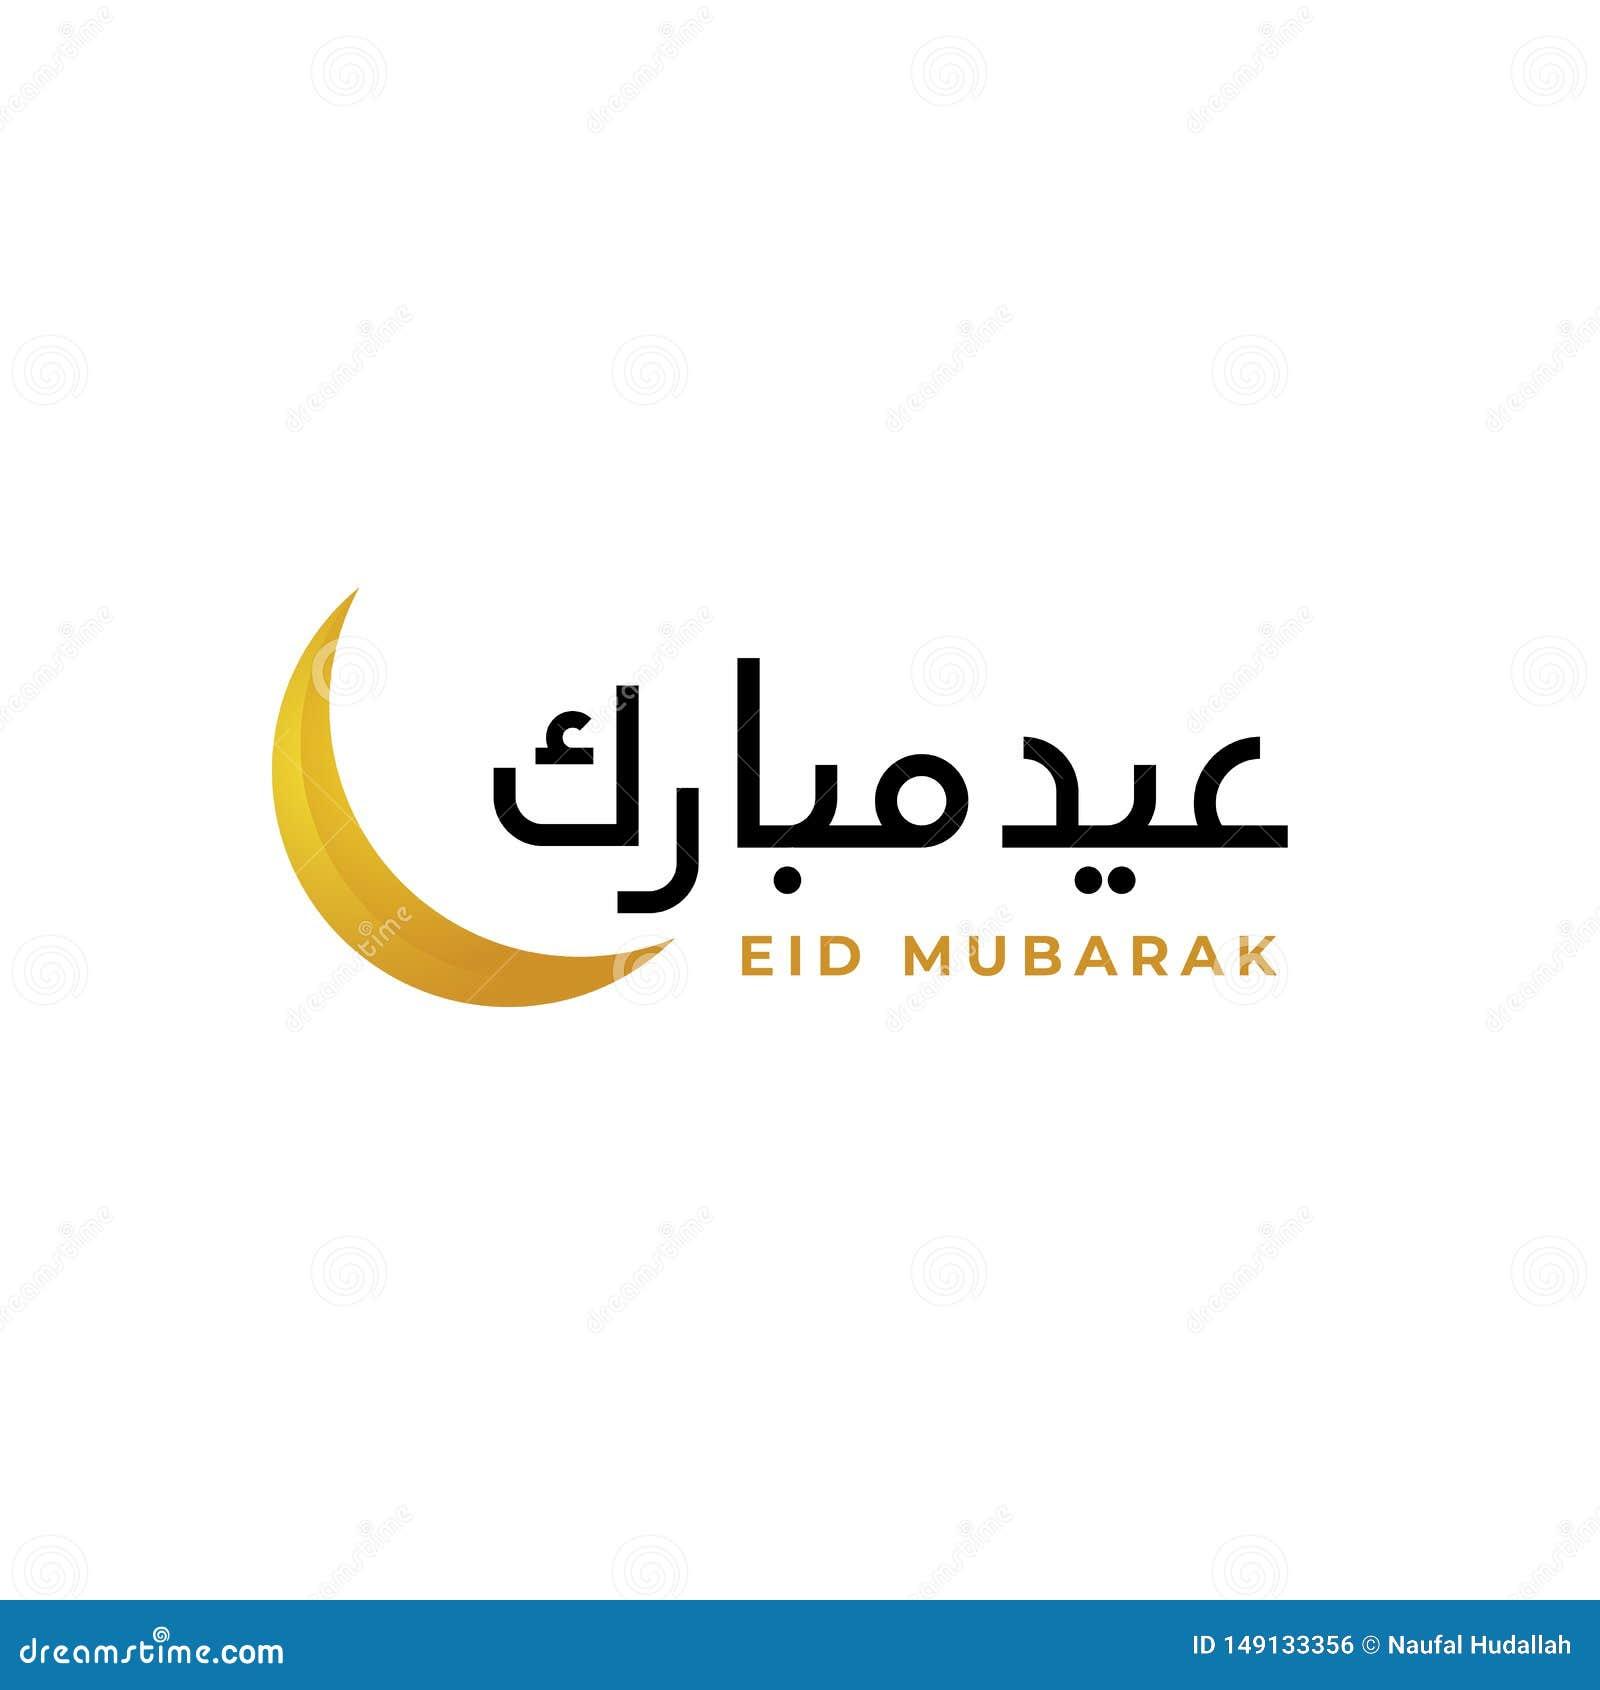 Eid Mubarak Arabic Calligraphy With Crescent Moon Ornament And Text Vector Illustration Design Stock Vector Illustration Of Great Lebaran 149133356